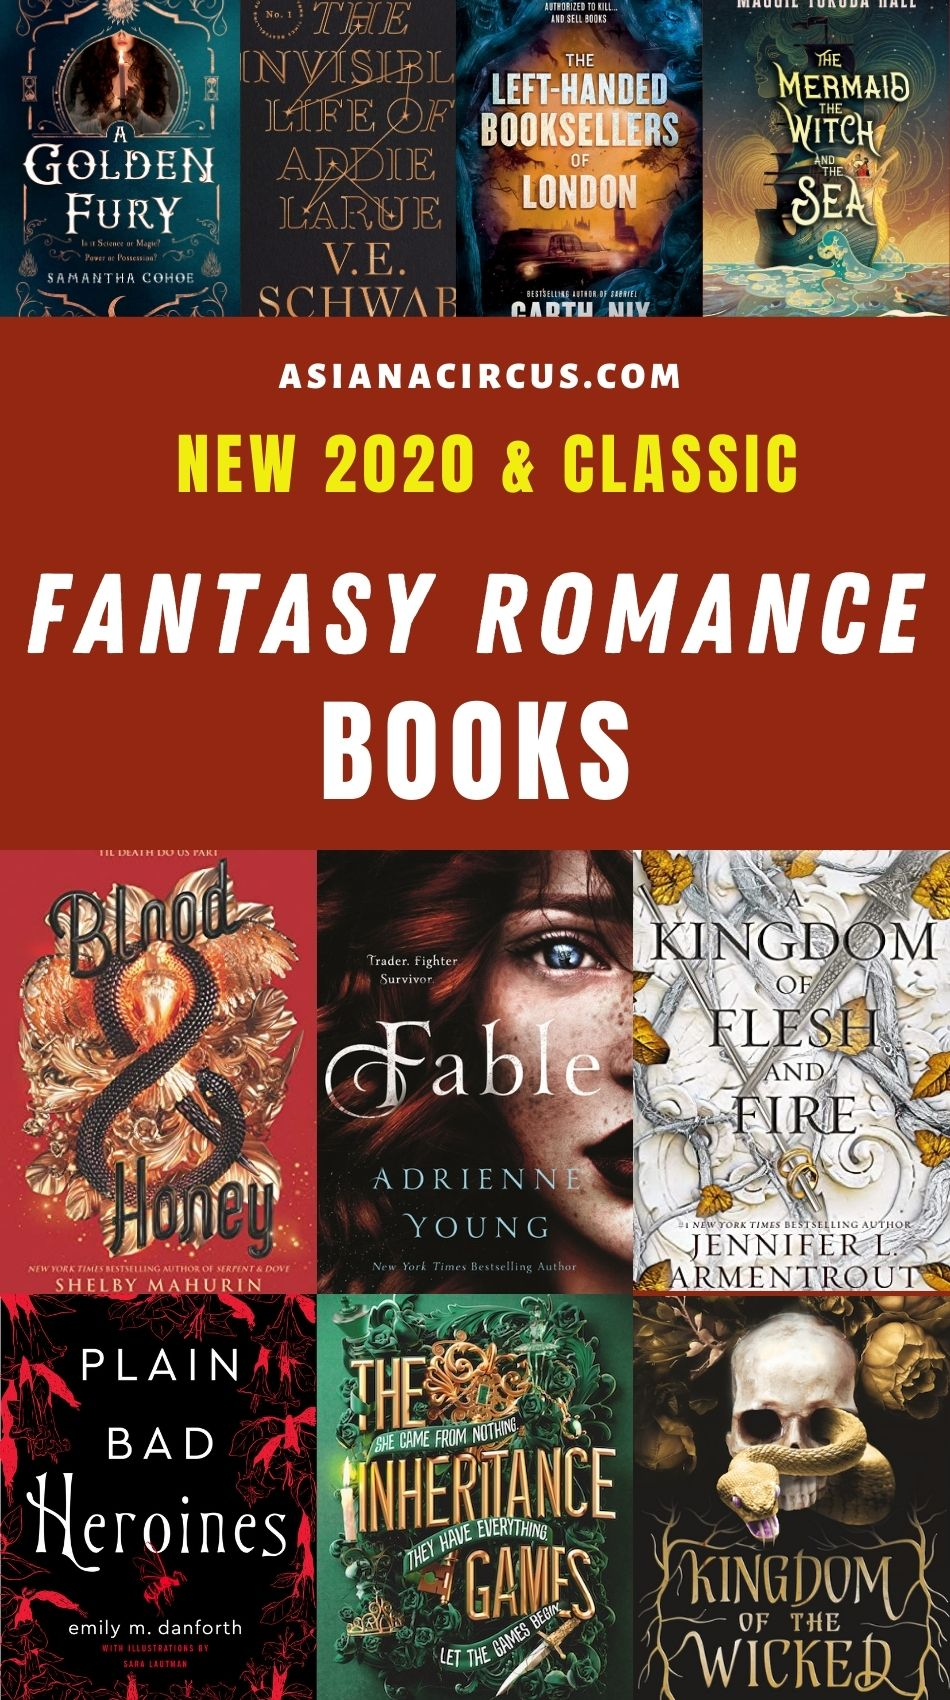 new 2020 fantasy romance books (1)